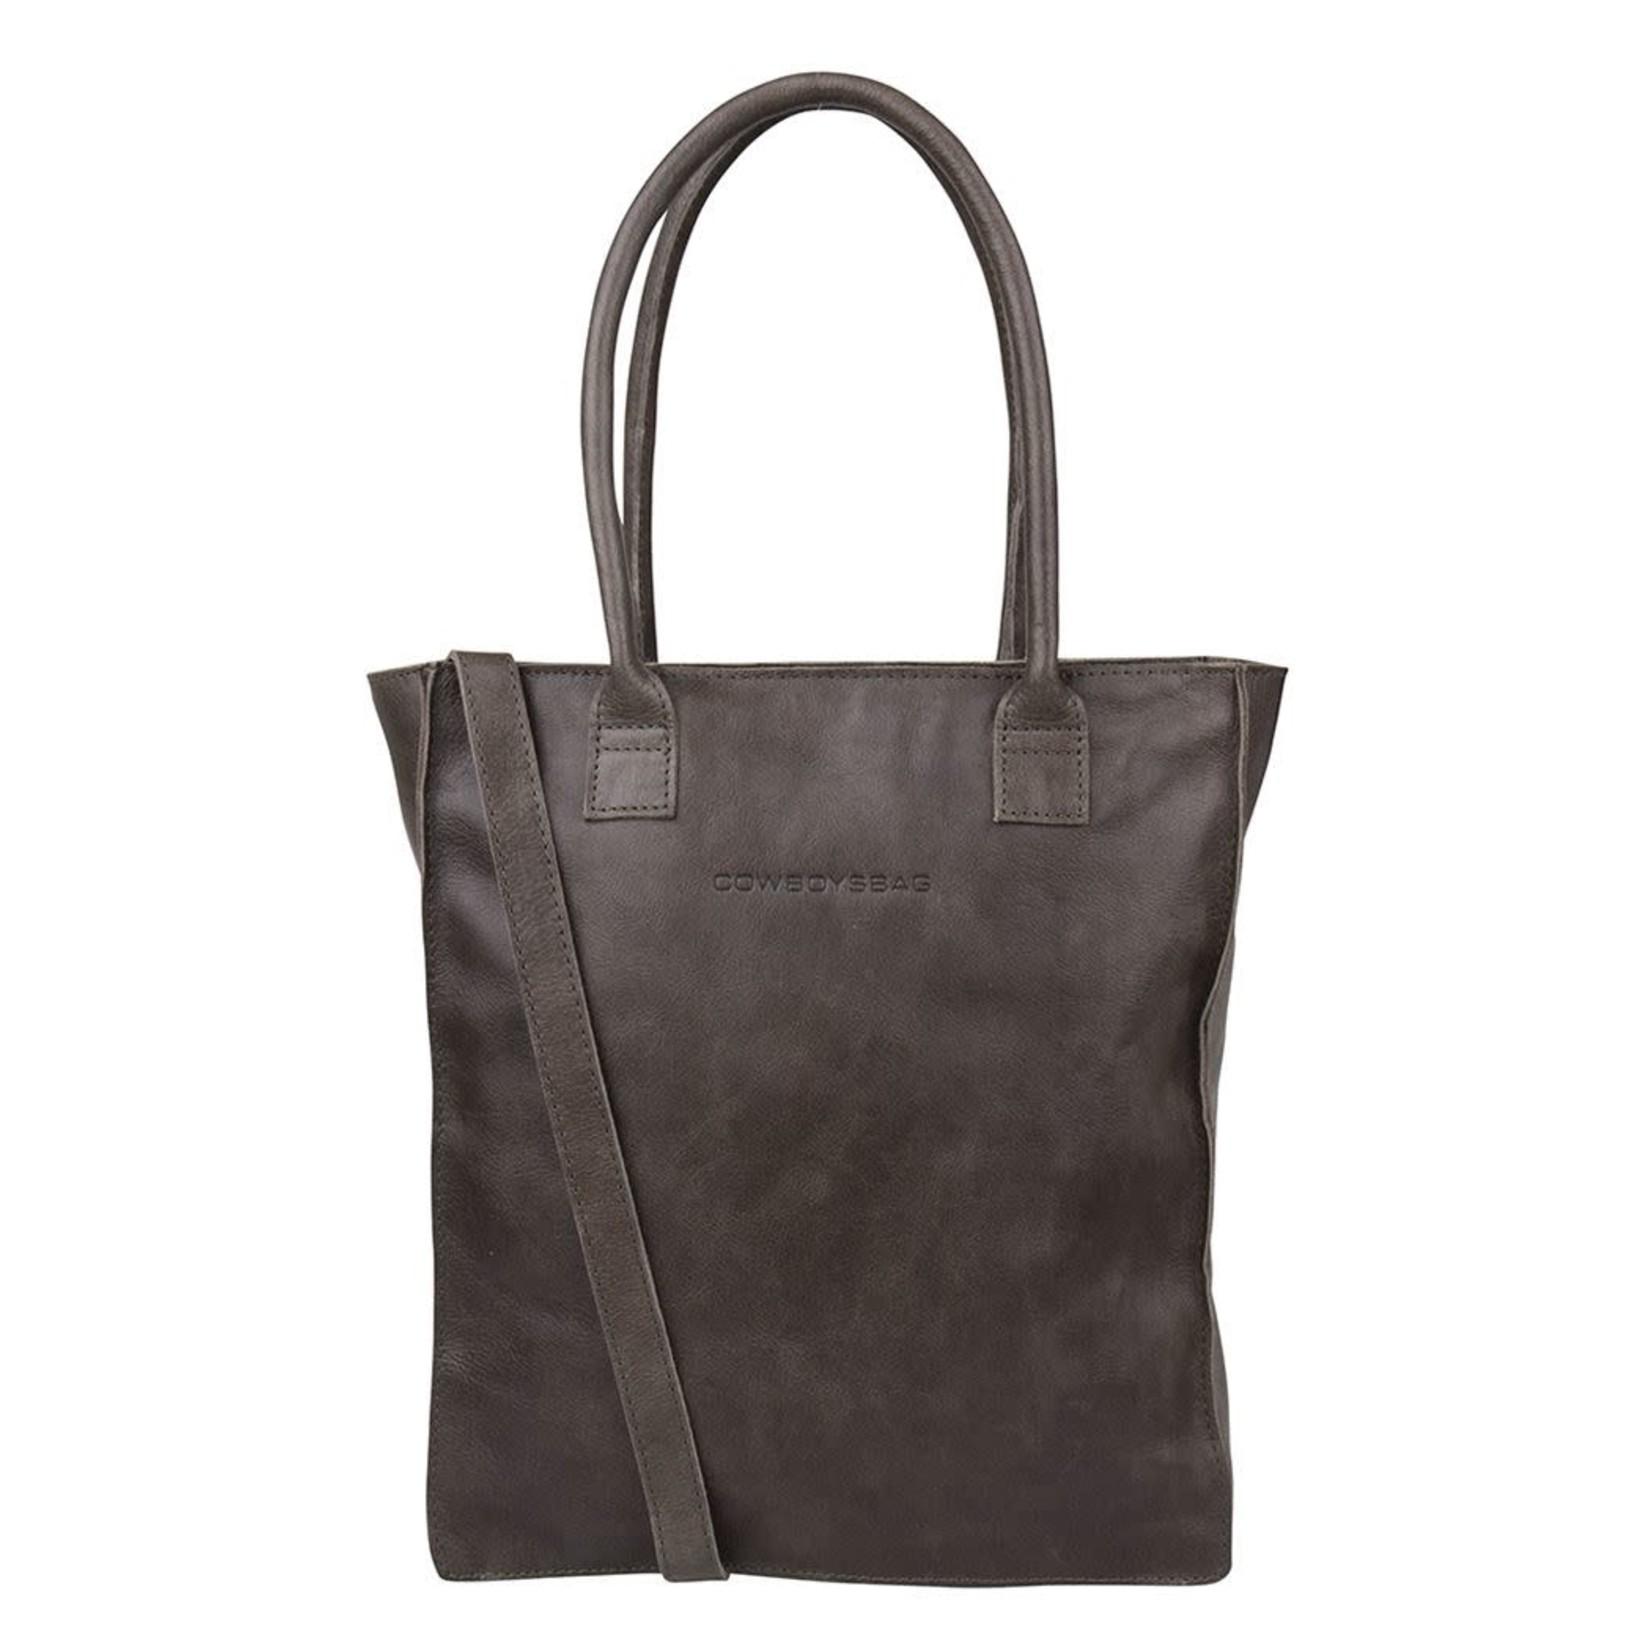 "Cowboysbag Laptop Bag Woodridge Storm Grey 13"""